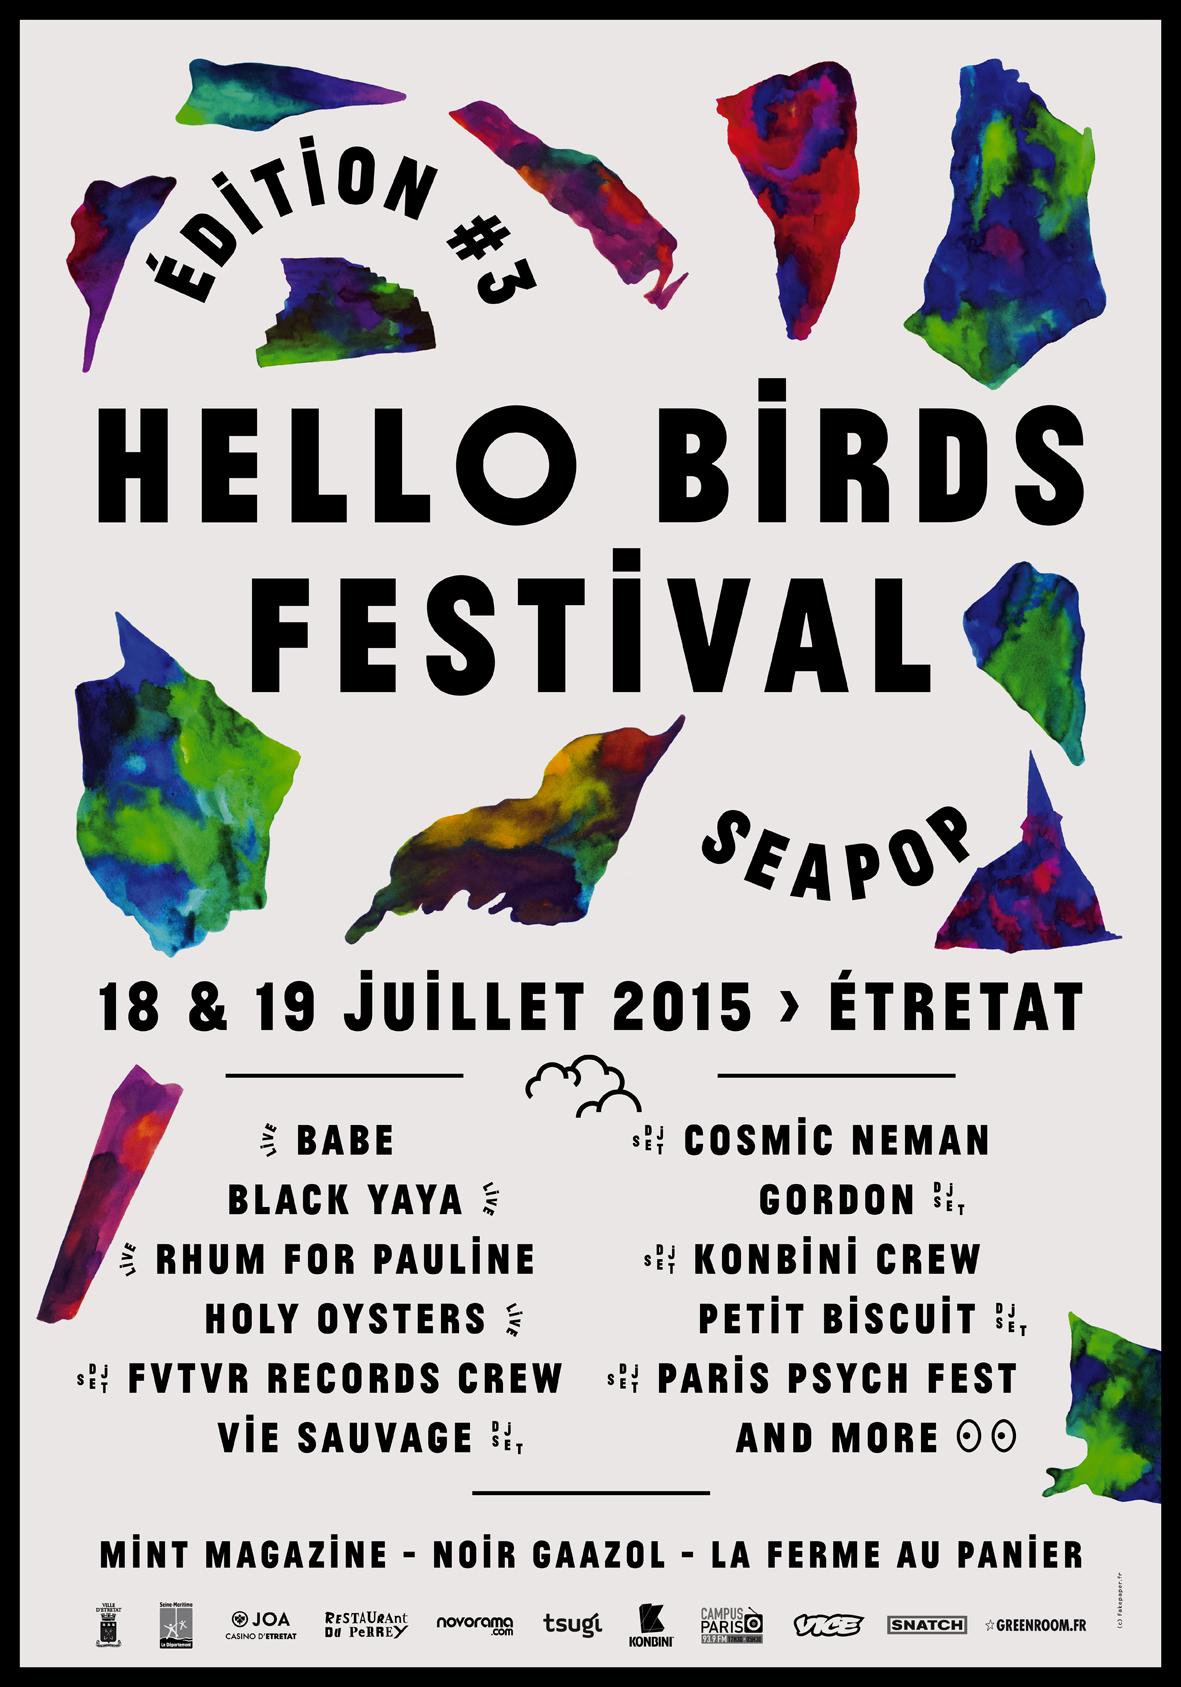 Gagnez votre tote bag Hello Birds #3